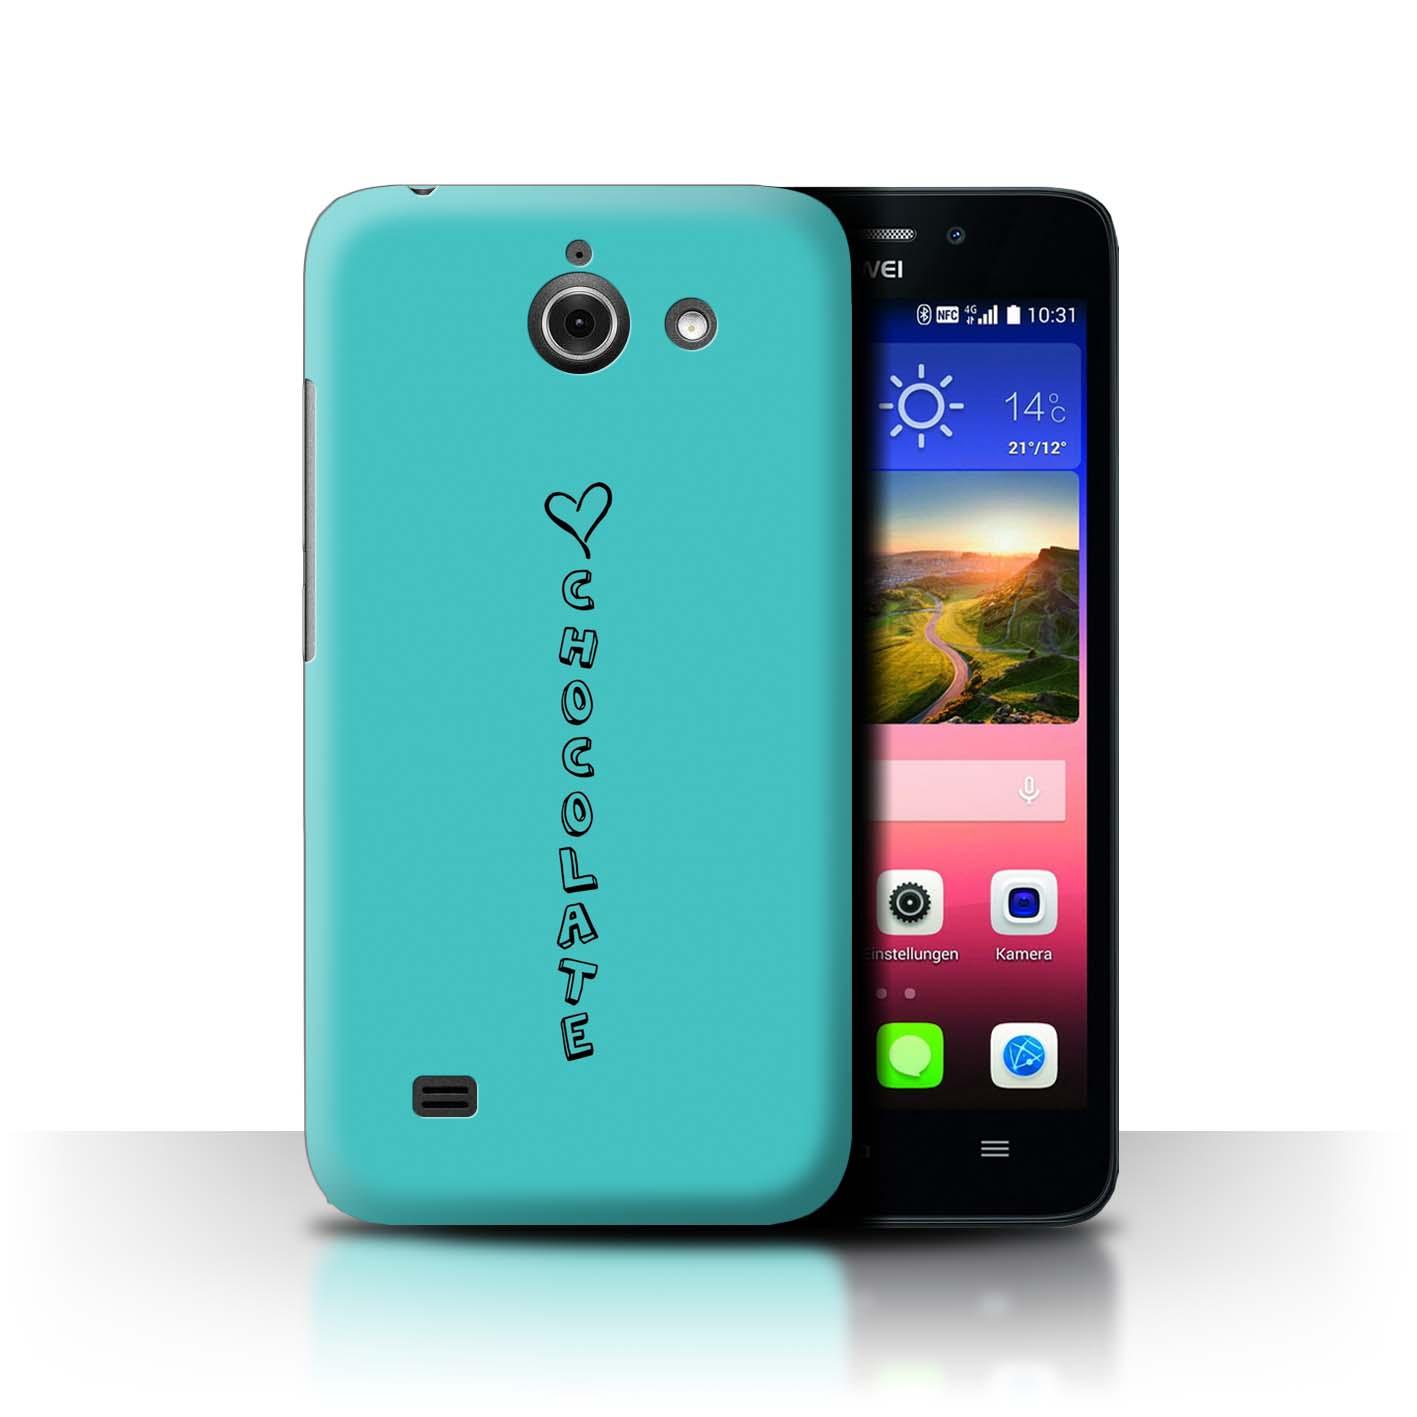 Stuff 4 teléfono caso/cubierta trasera para Huawei Ascend Y550 LTE/Corazón Xoxo